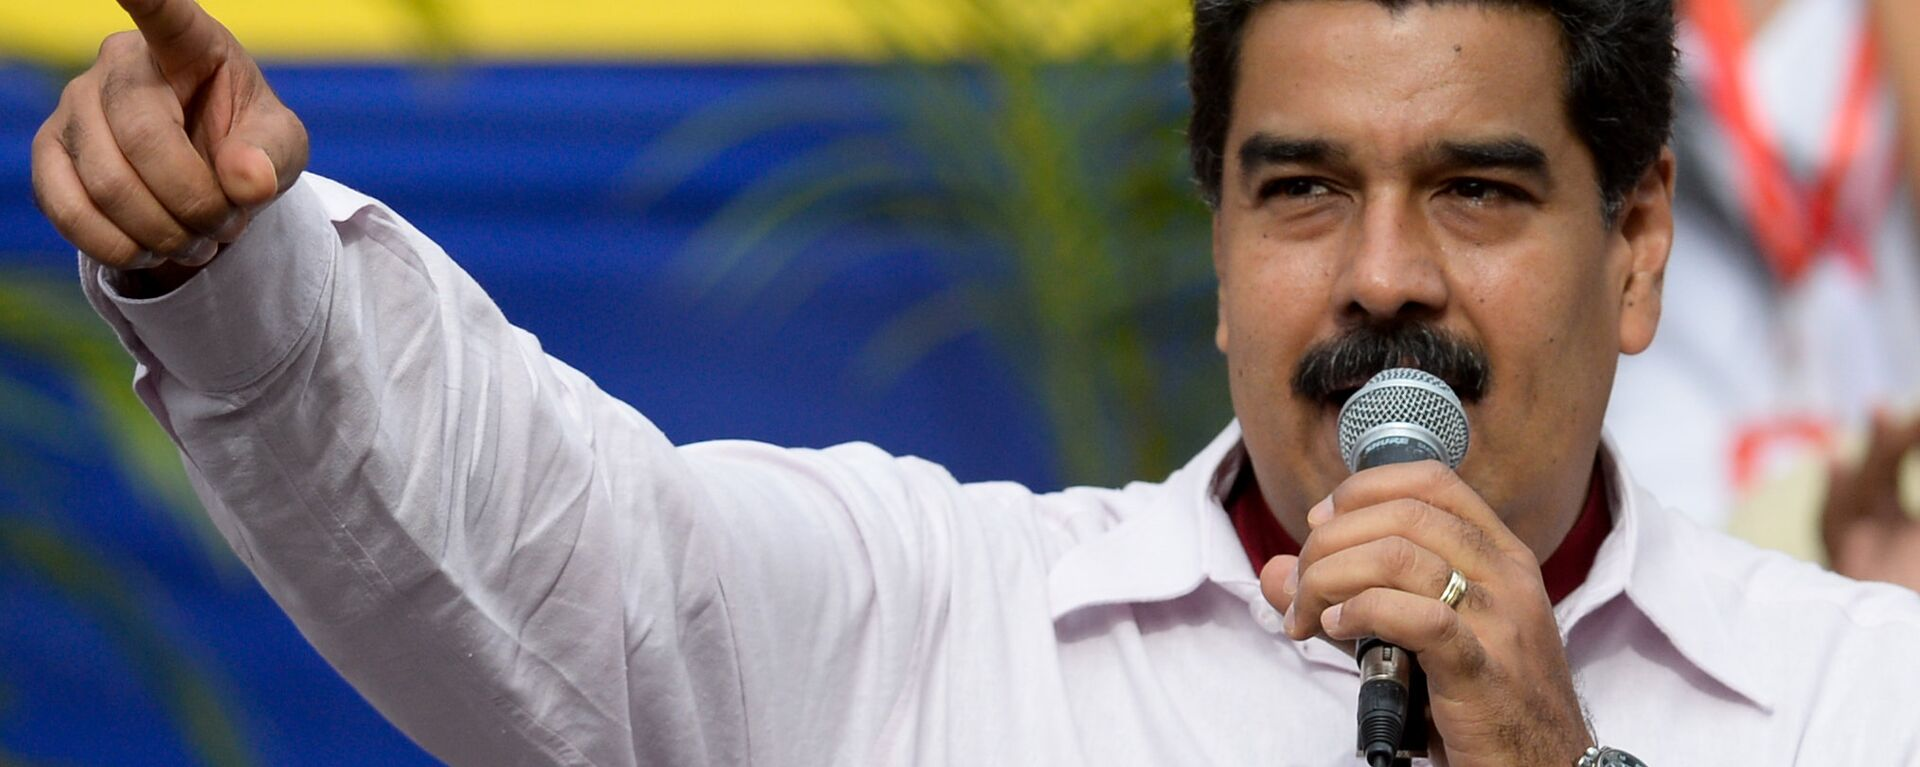 Venezuelan President Nicolas Maduro delivers a speech during a rally in Caracas - Sputnik Mundo, 1920, 25.07.2021